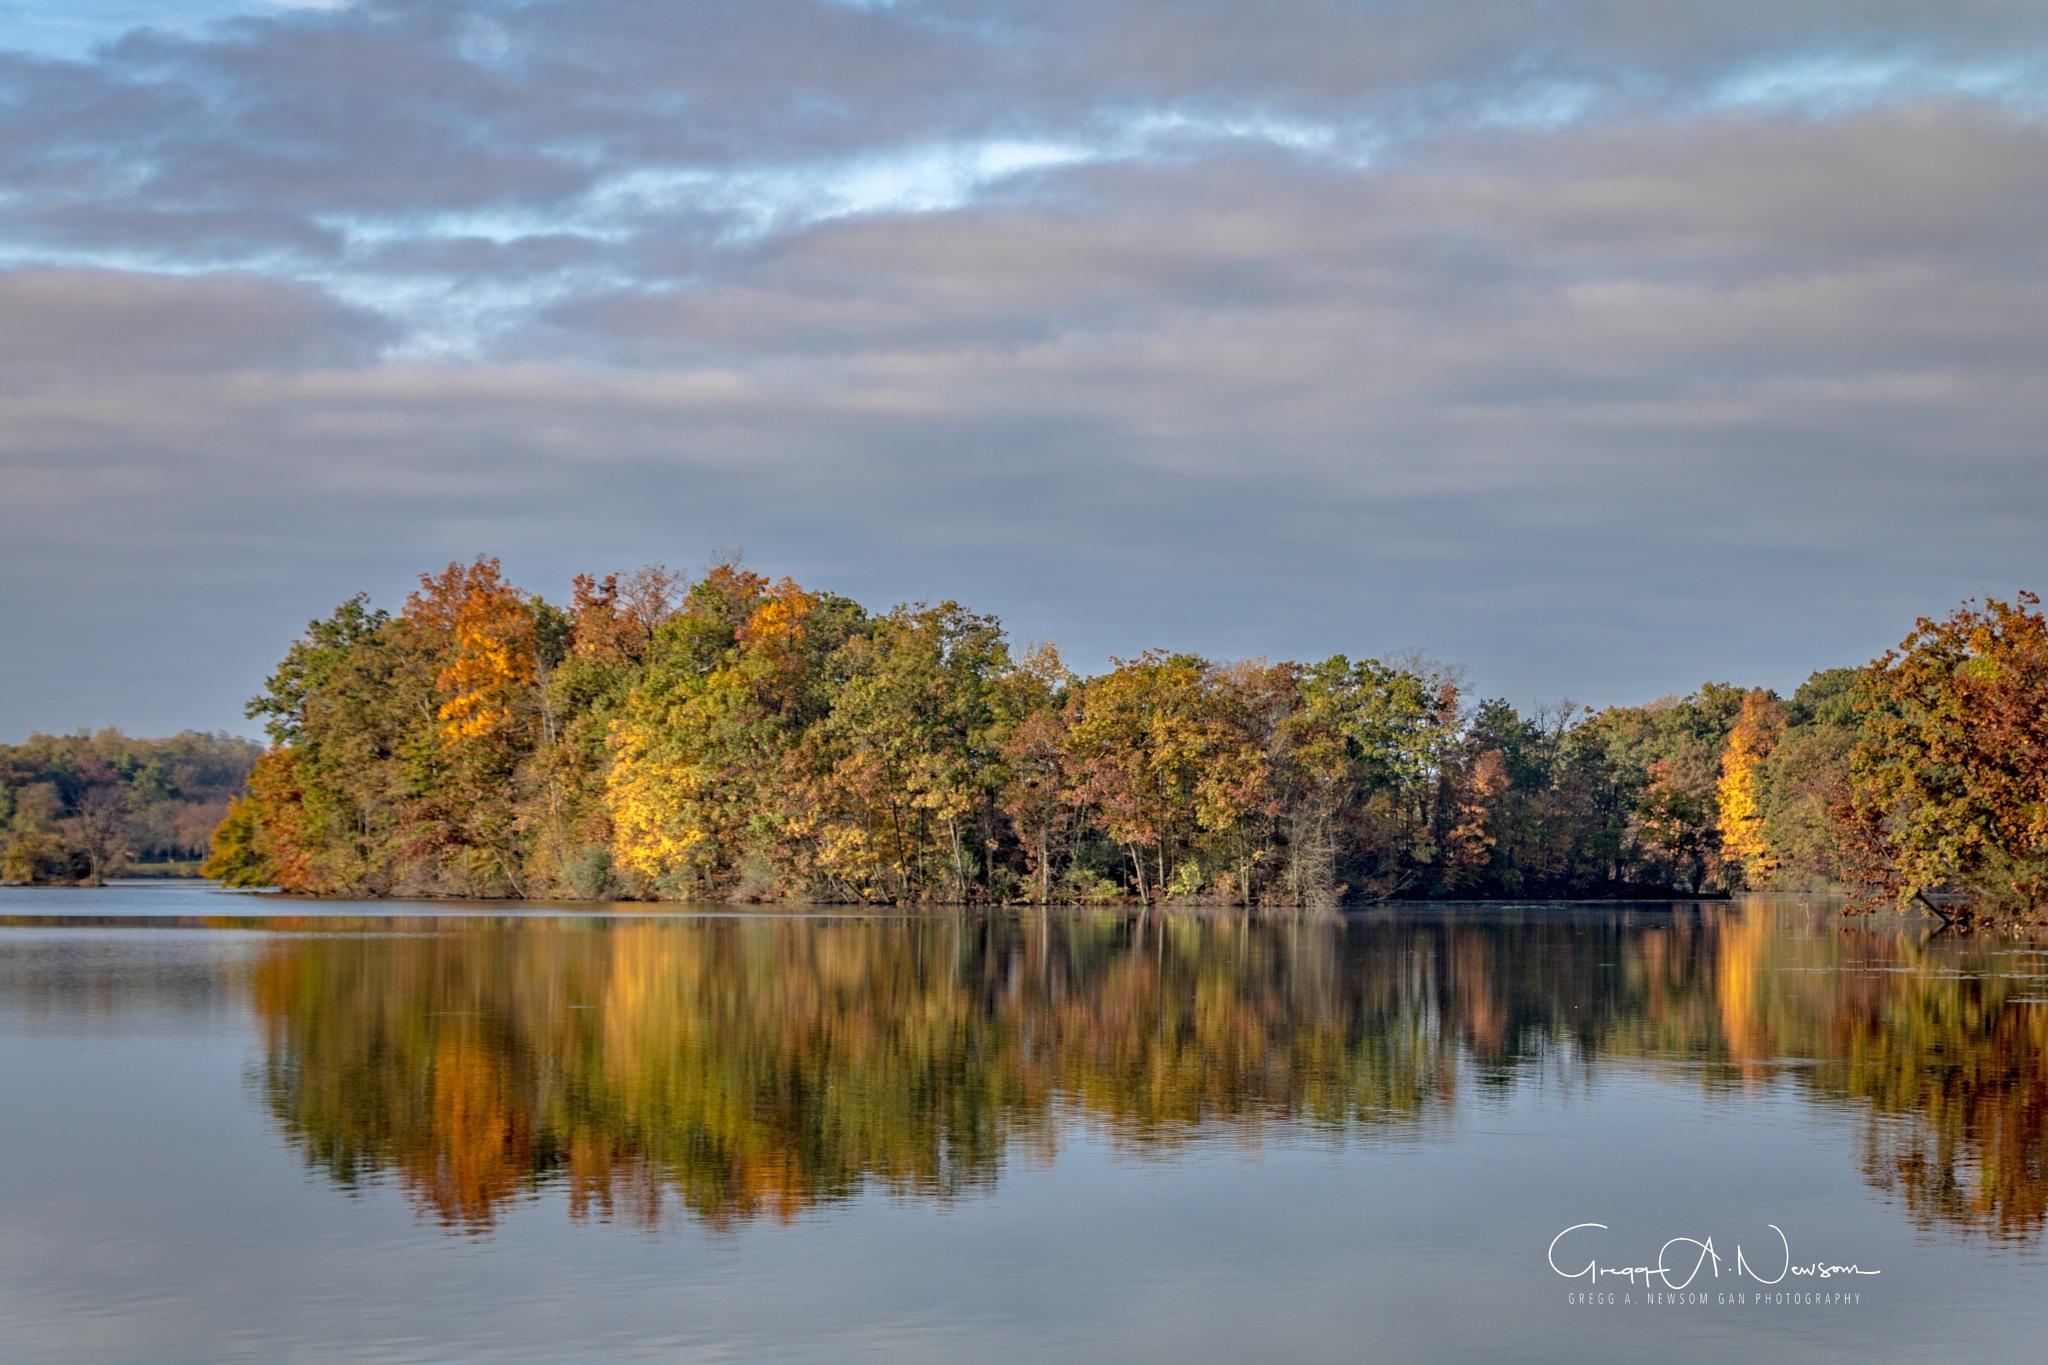 Reflections 10 by Gnewsom324